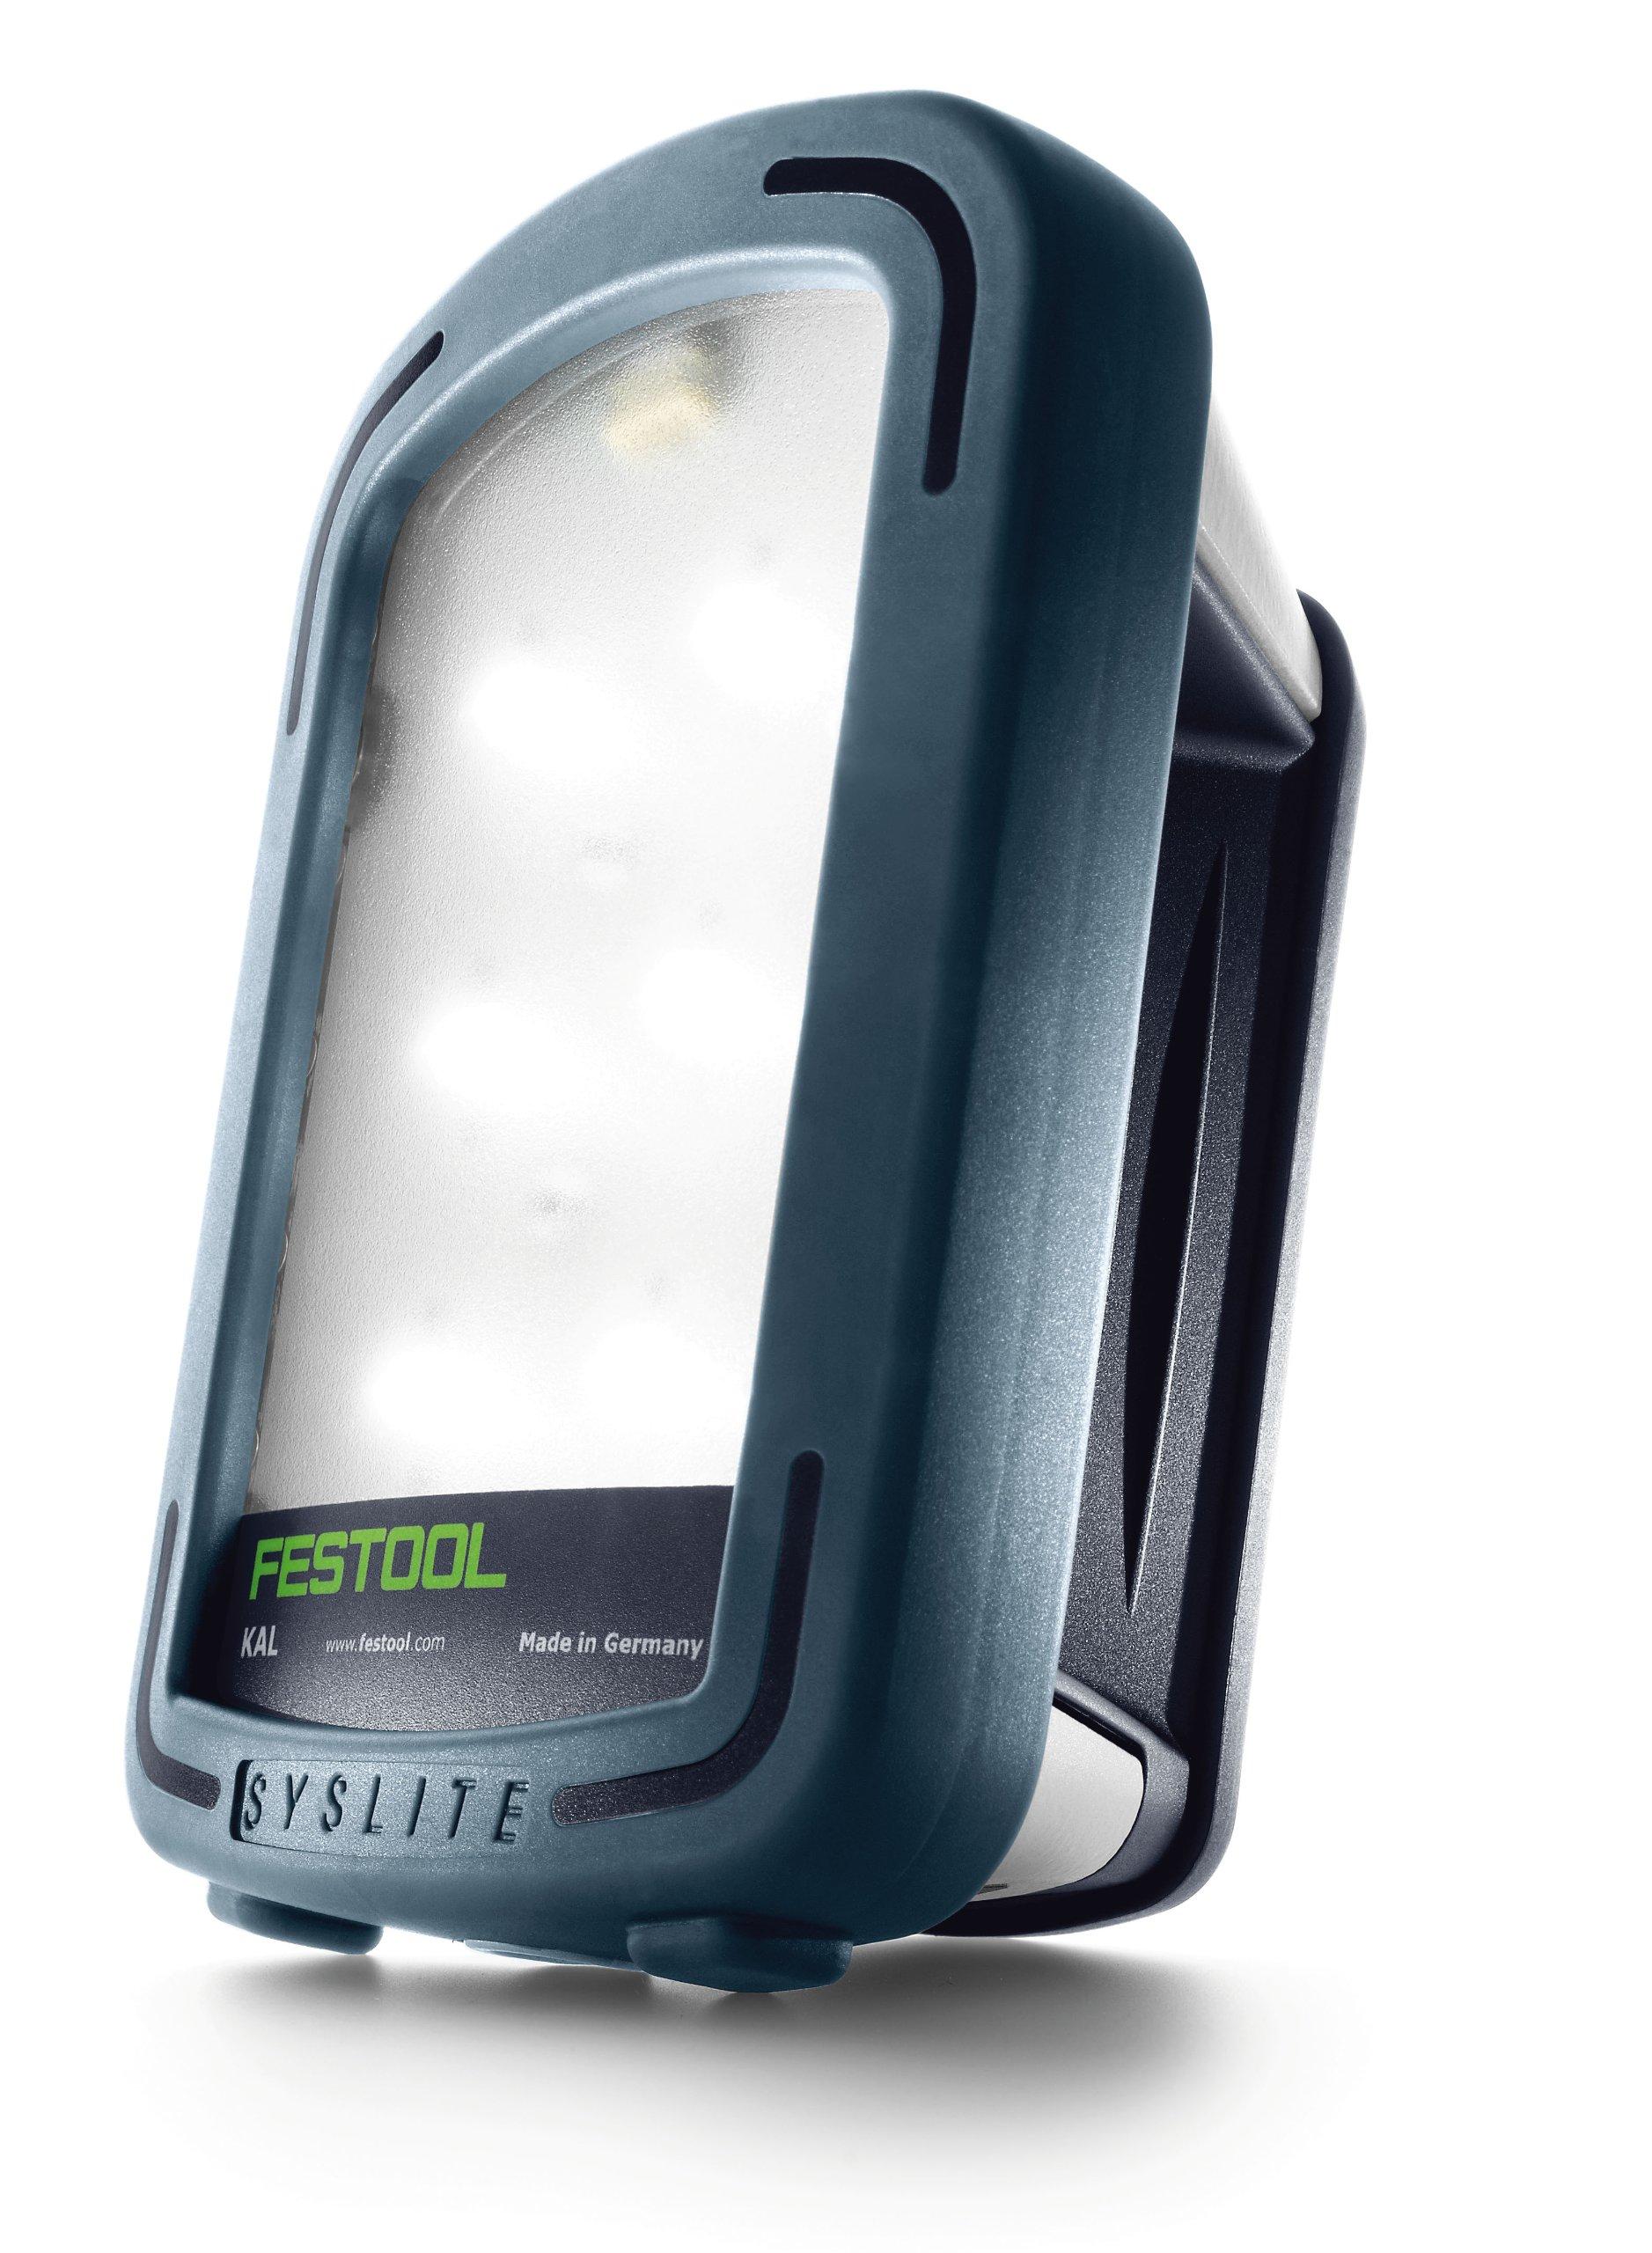 Festool 498568 SysLite LED Work Lamp by Festool (Image #6)